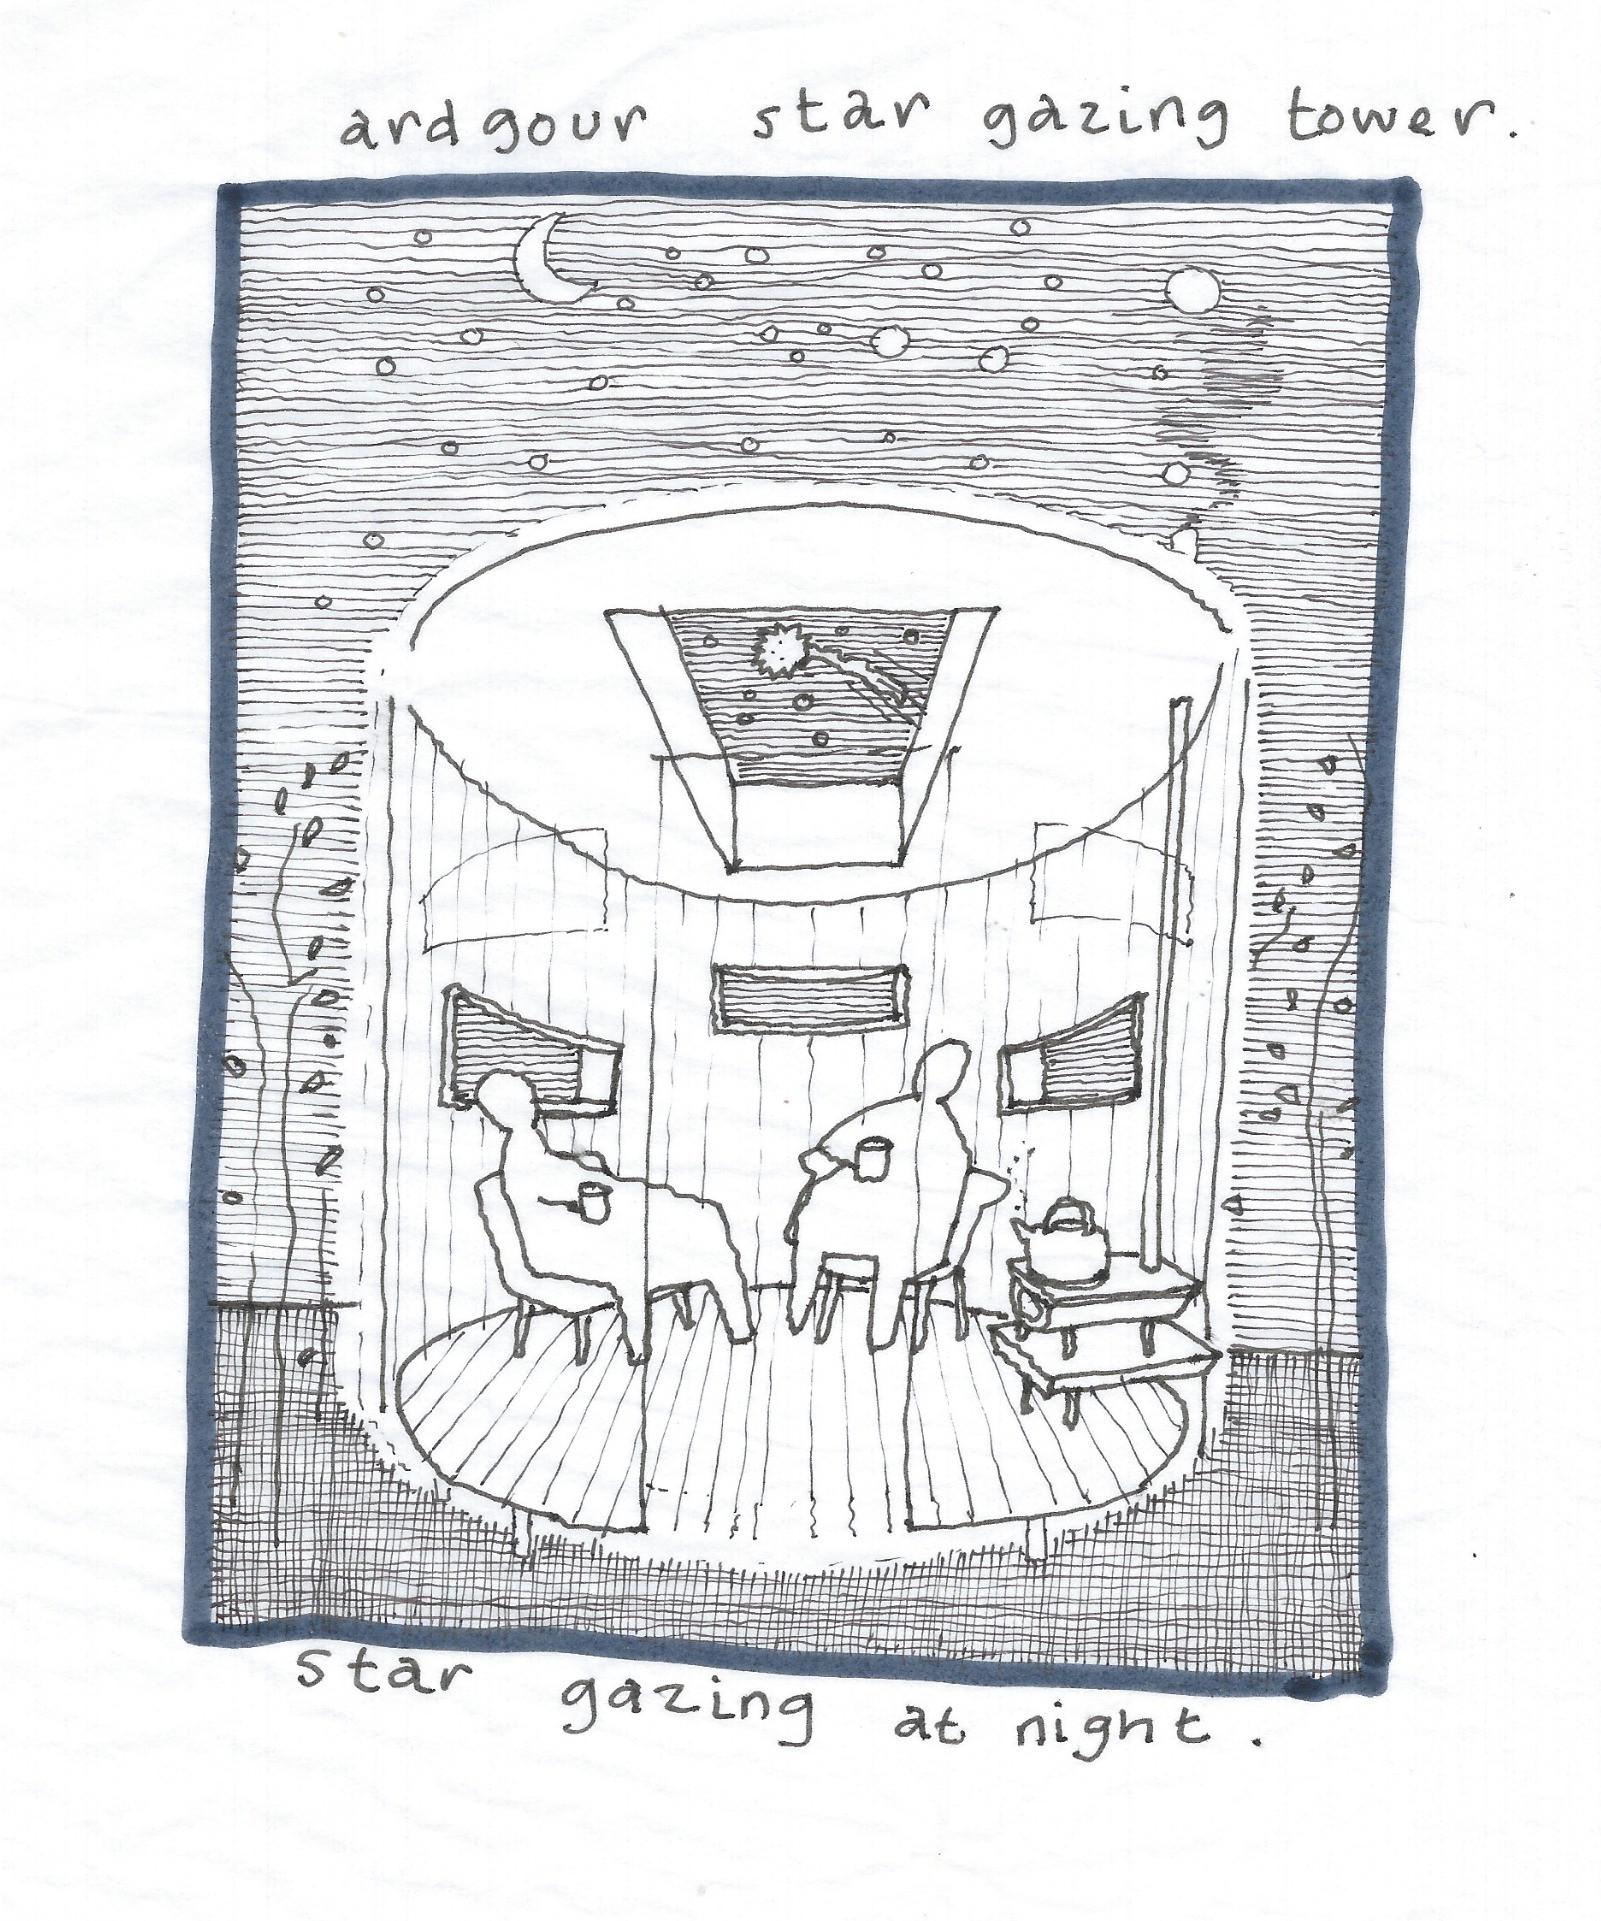 Ardgour stargazer sketch